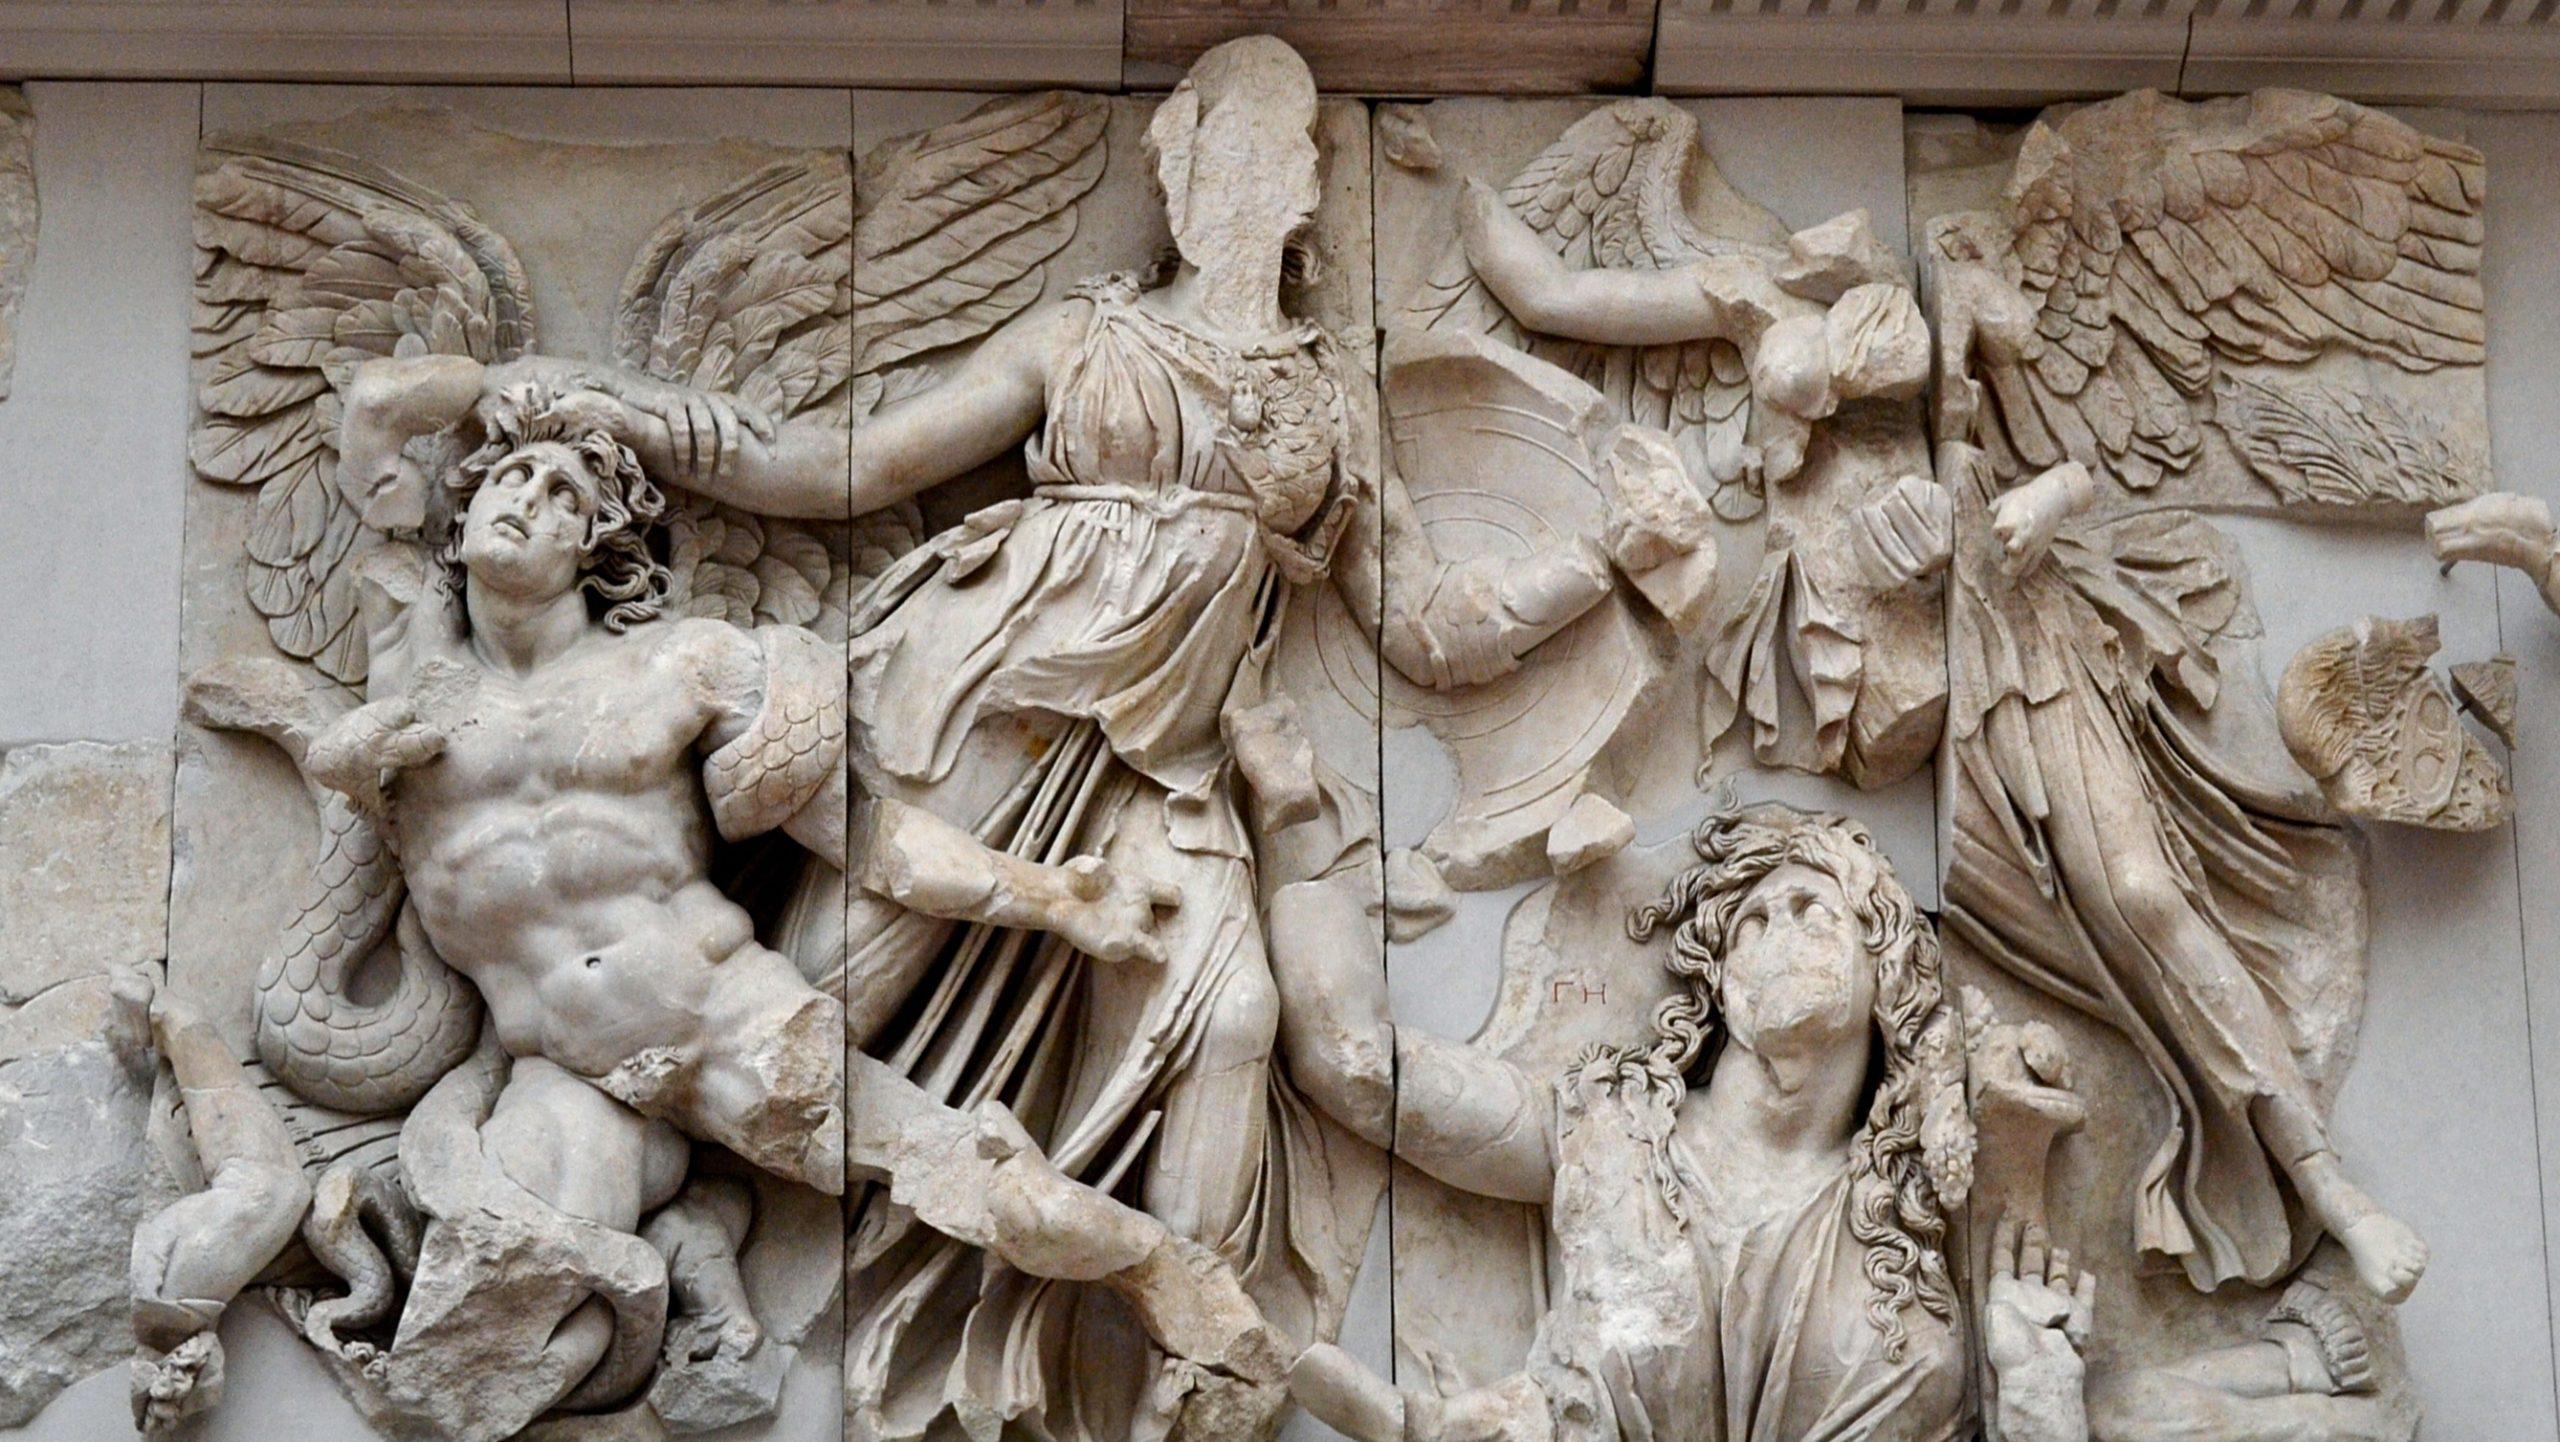 Athena panel, east frieze, Pergamon Altar, (ca. 197-139 BCE), Staatliche Museen, Berlin